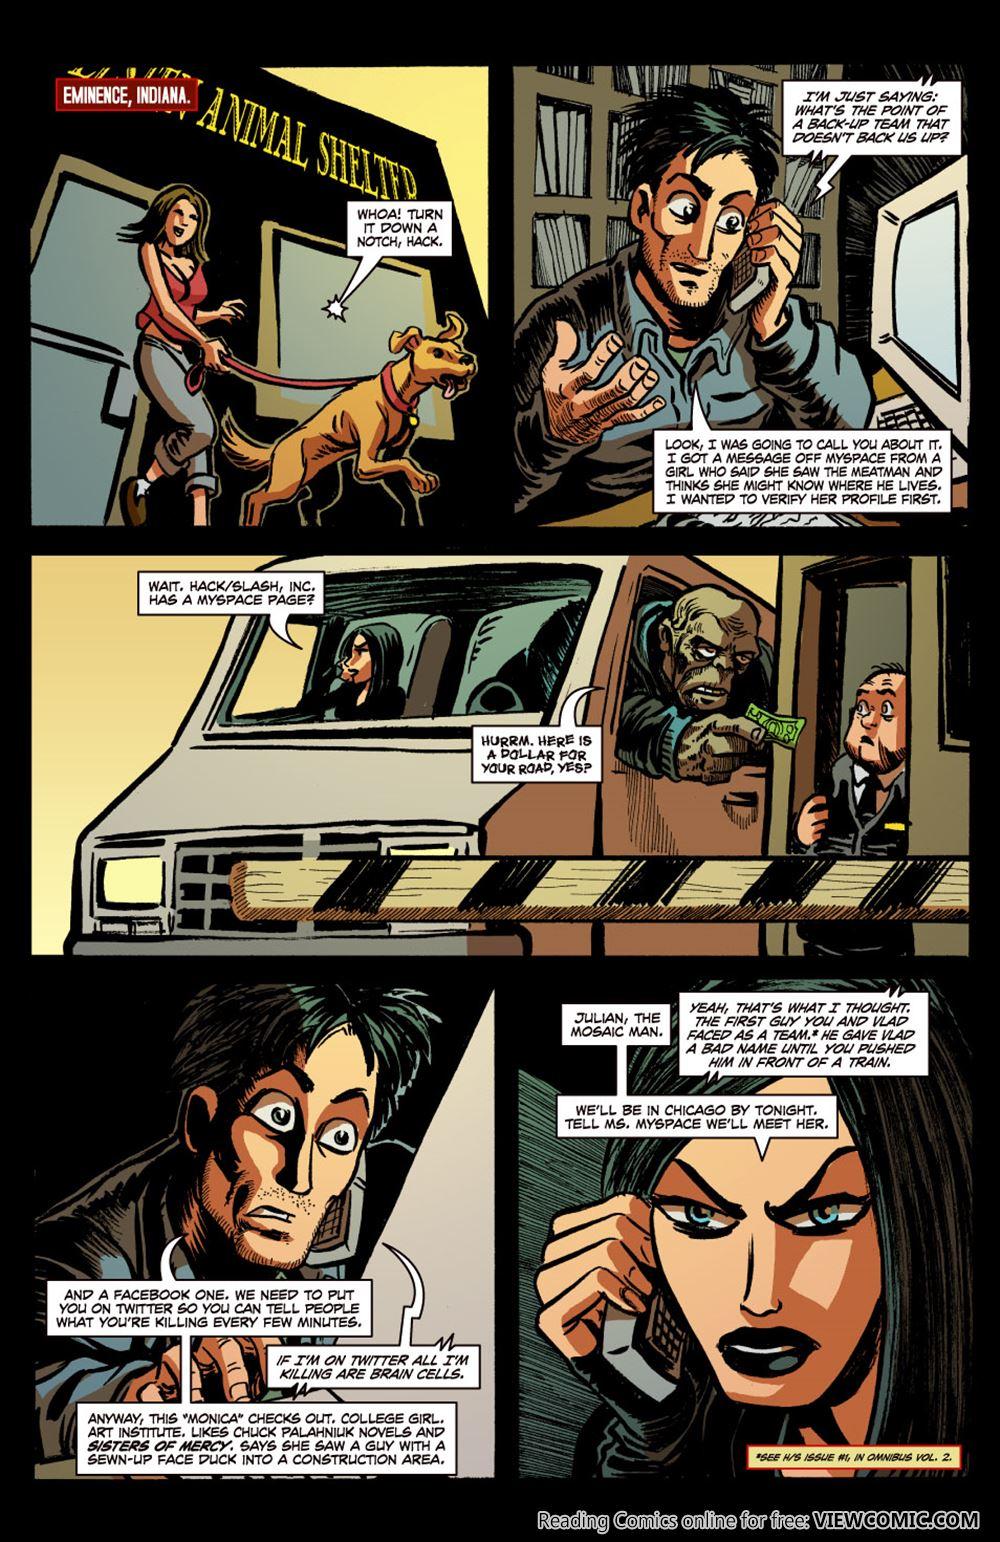 Hack-Slash – The Series 026 (2009) | Viewcomic reading